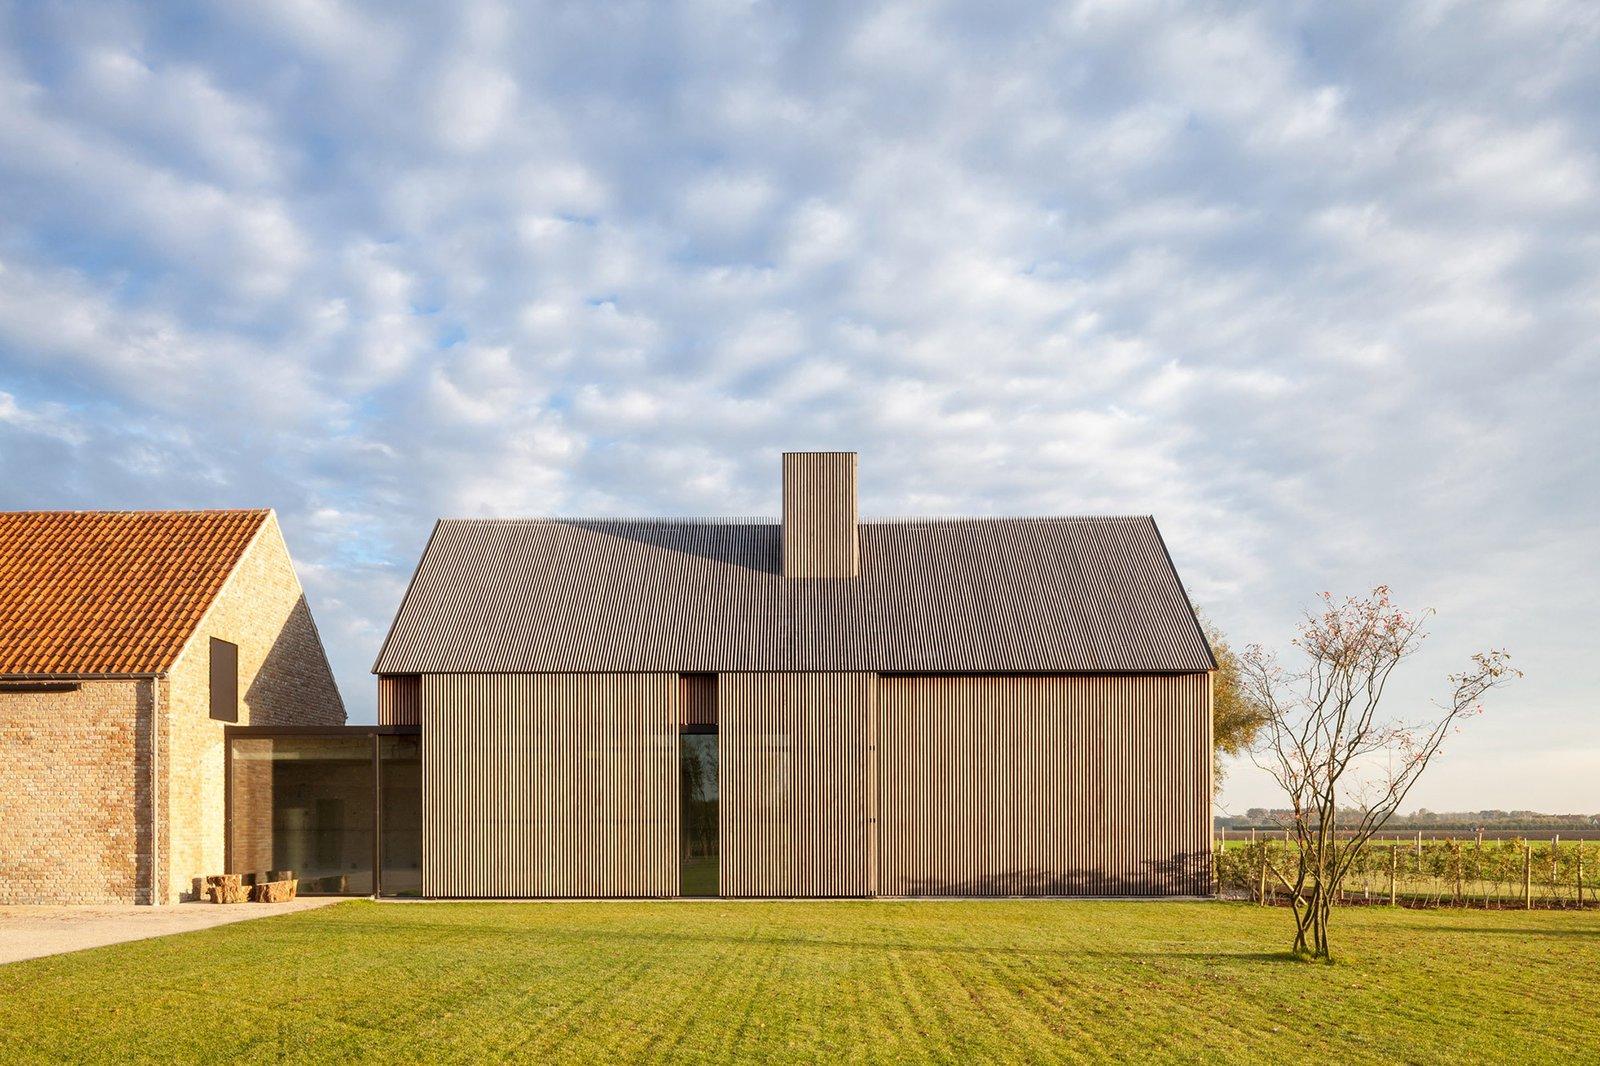 Farmhouse Burkeldijk - Photo 1 of 10